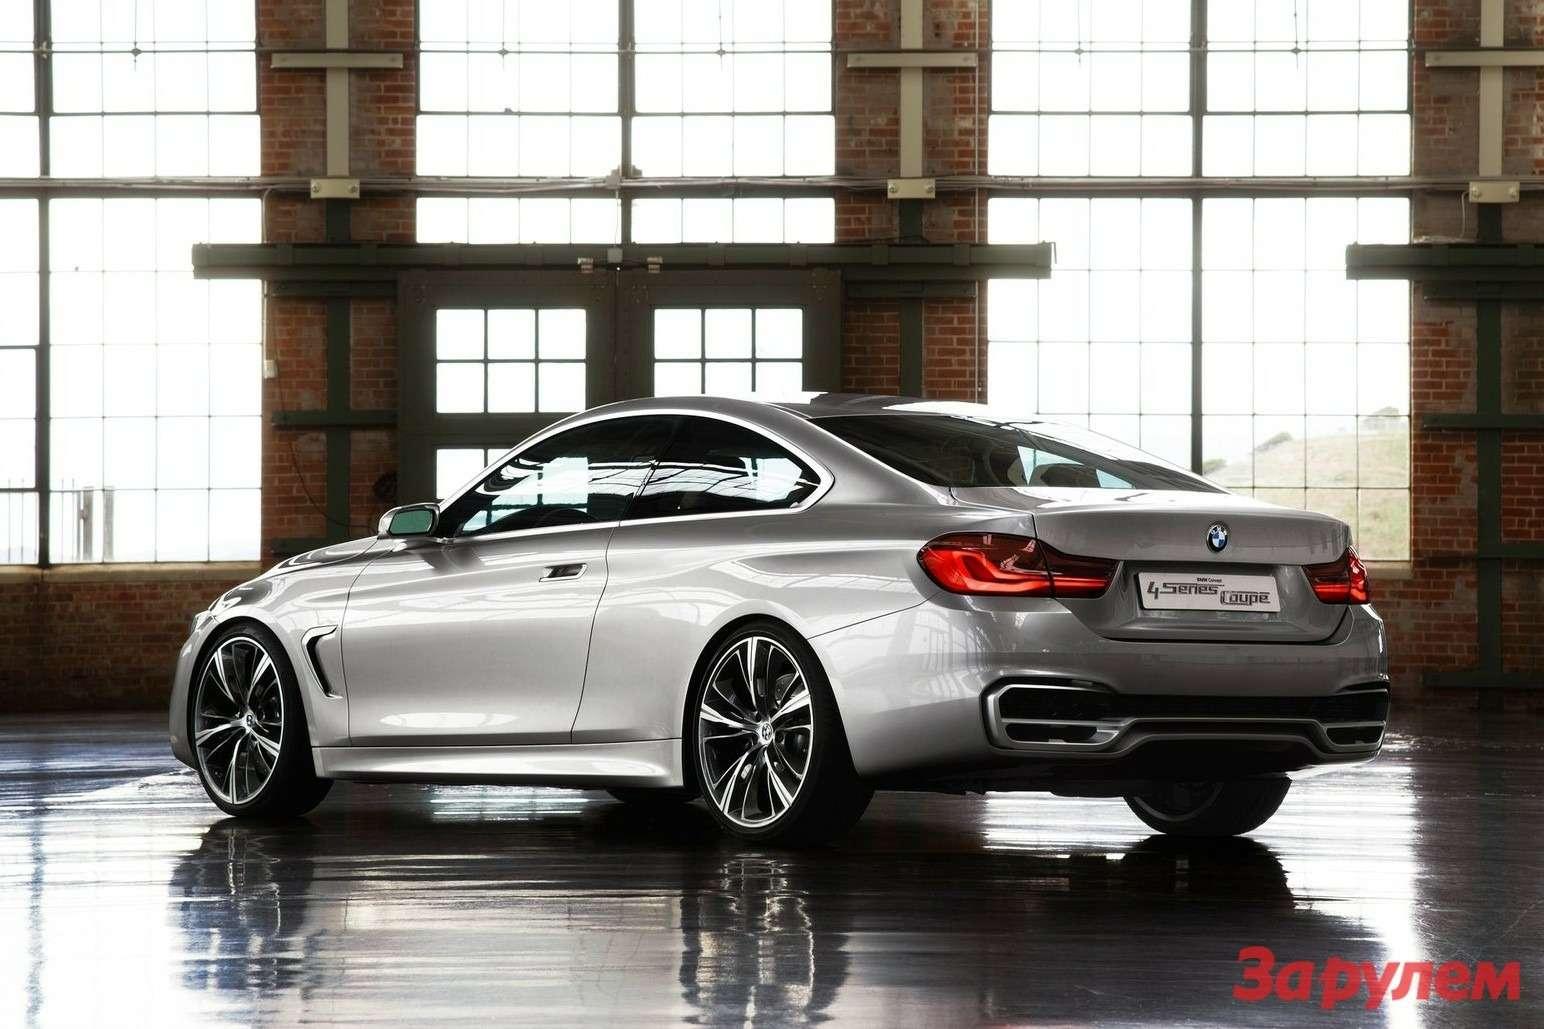 BMW-4-Series_Coupe_Concept_2013_1600x1200_wallpaper_0d